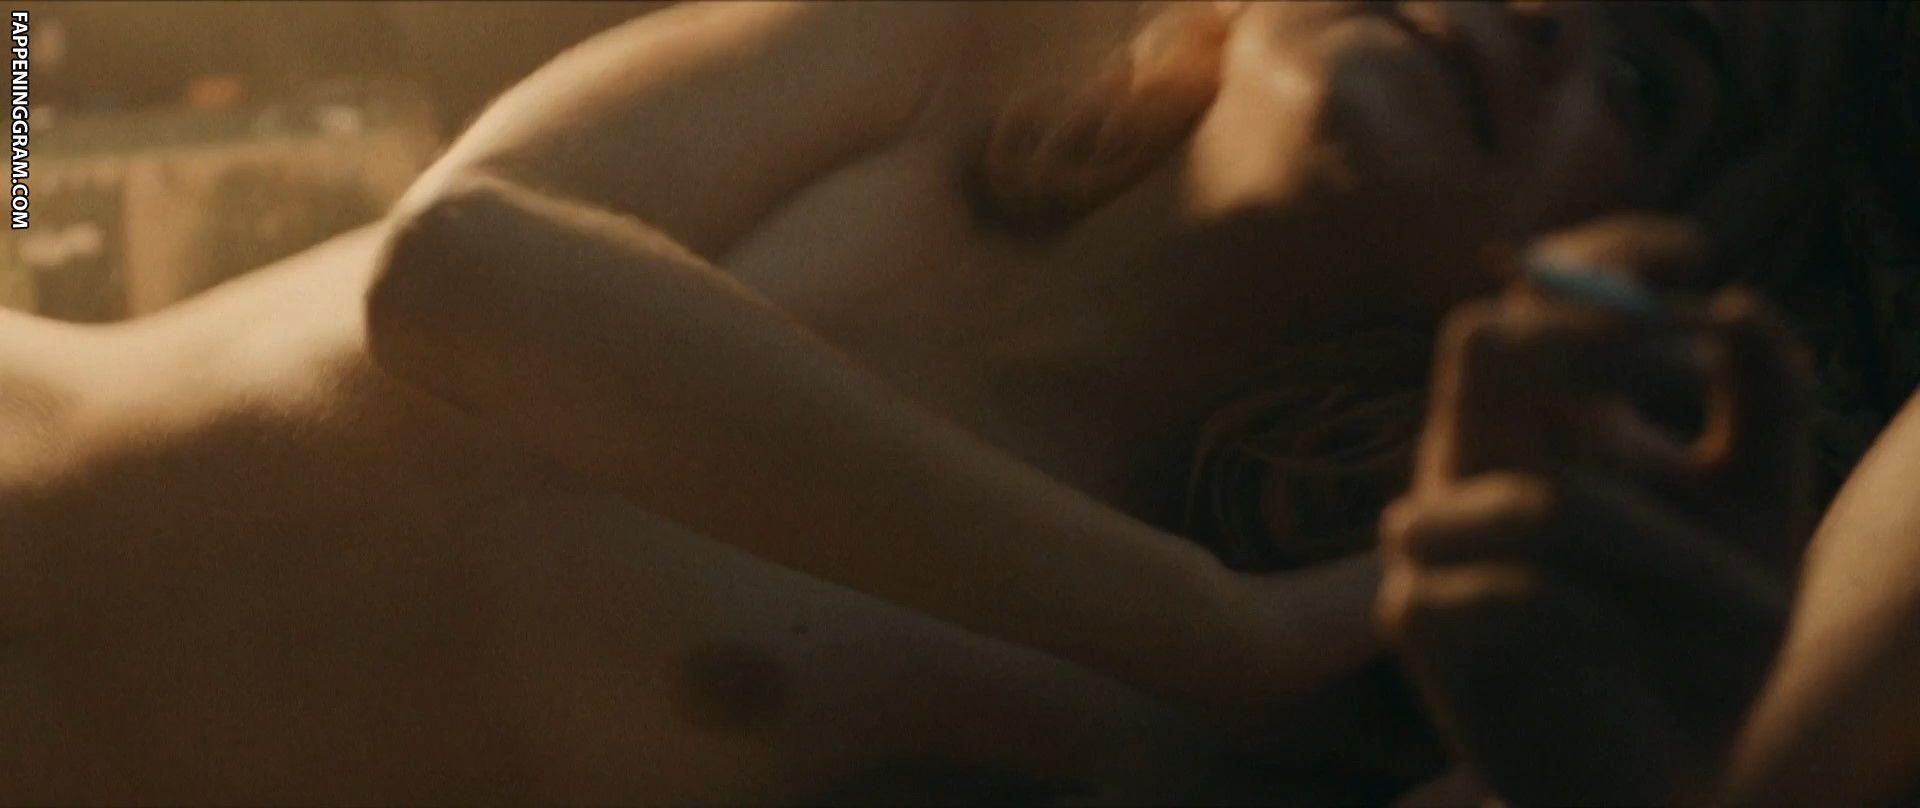 Victoria Styles Nude Scenes